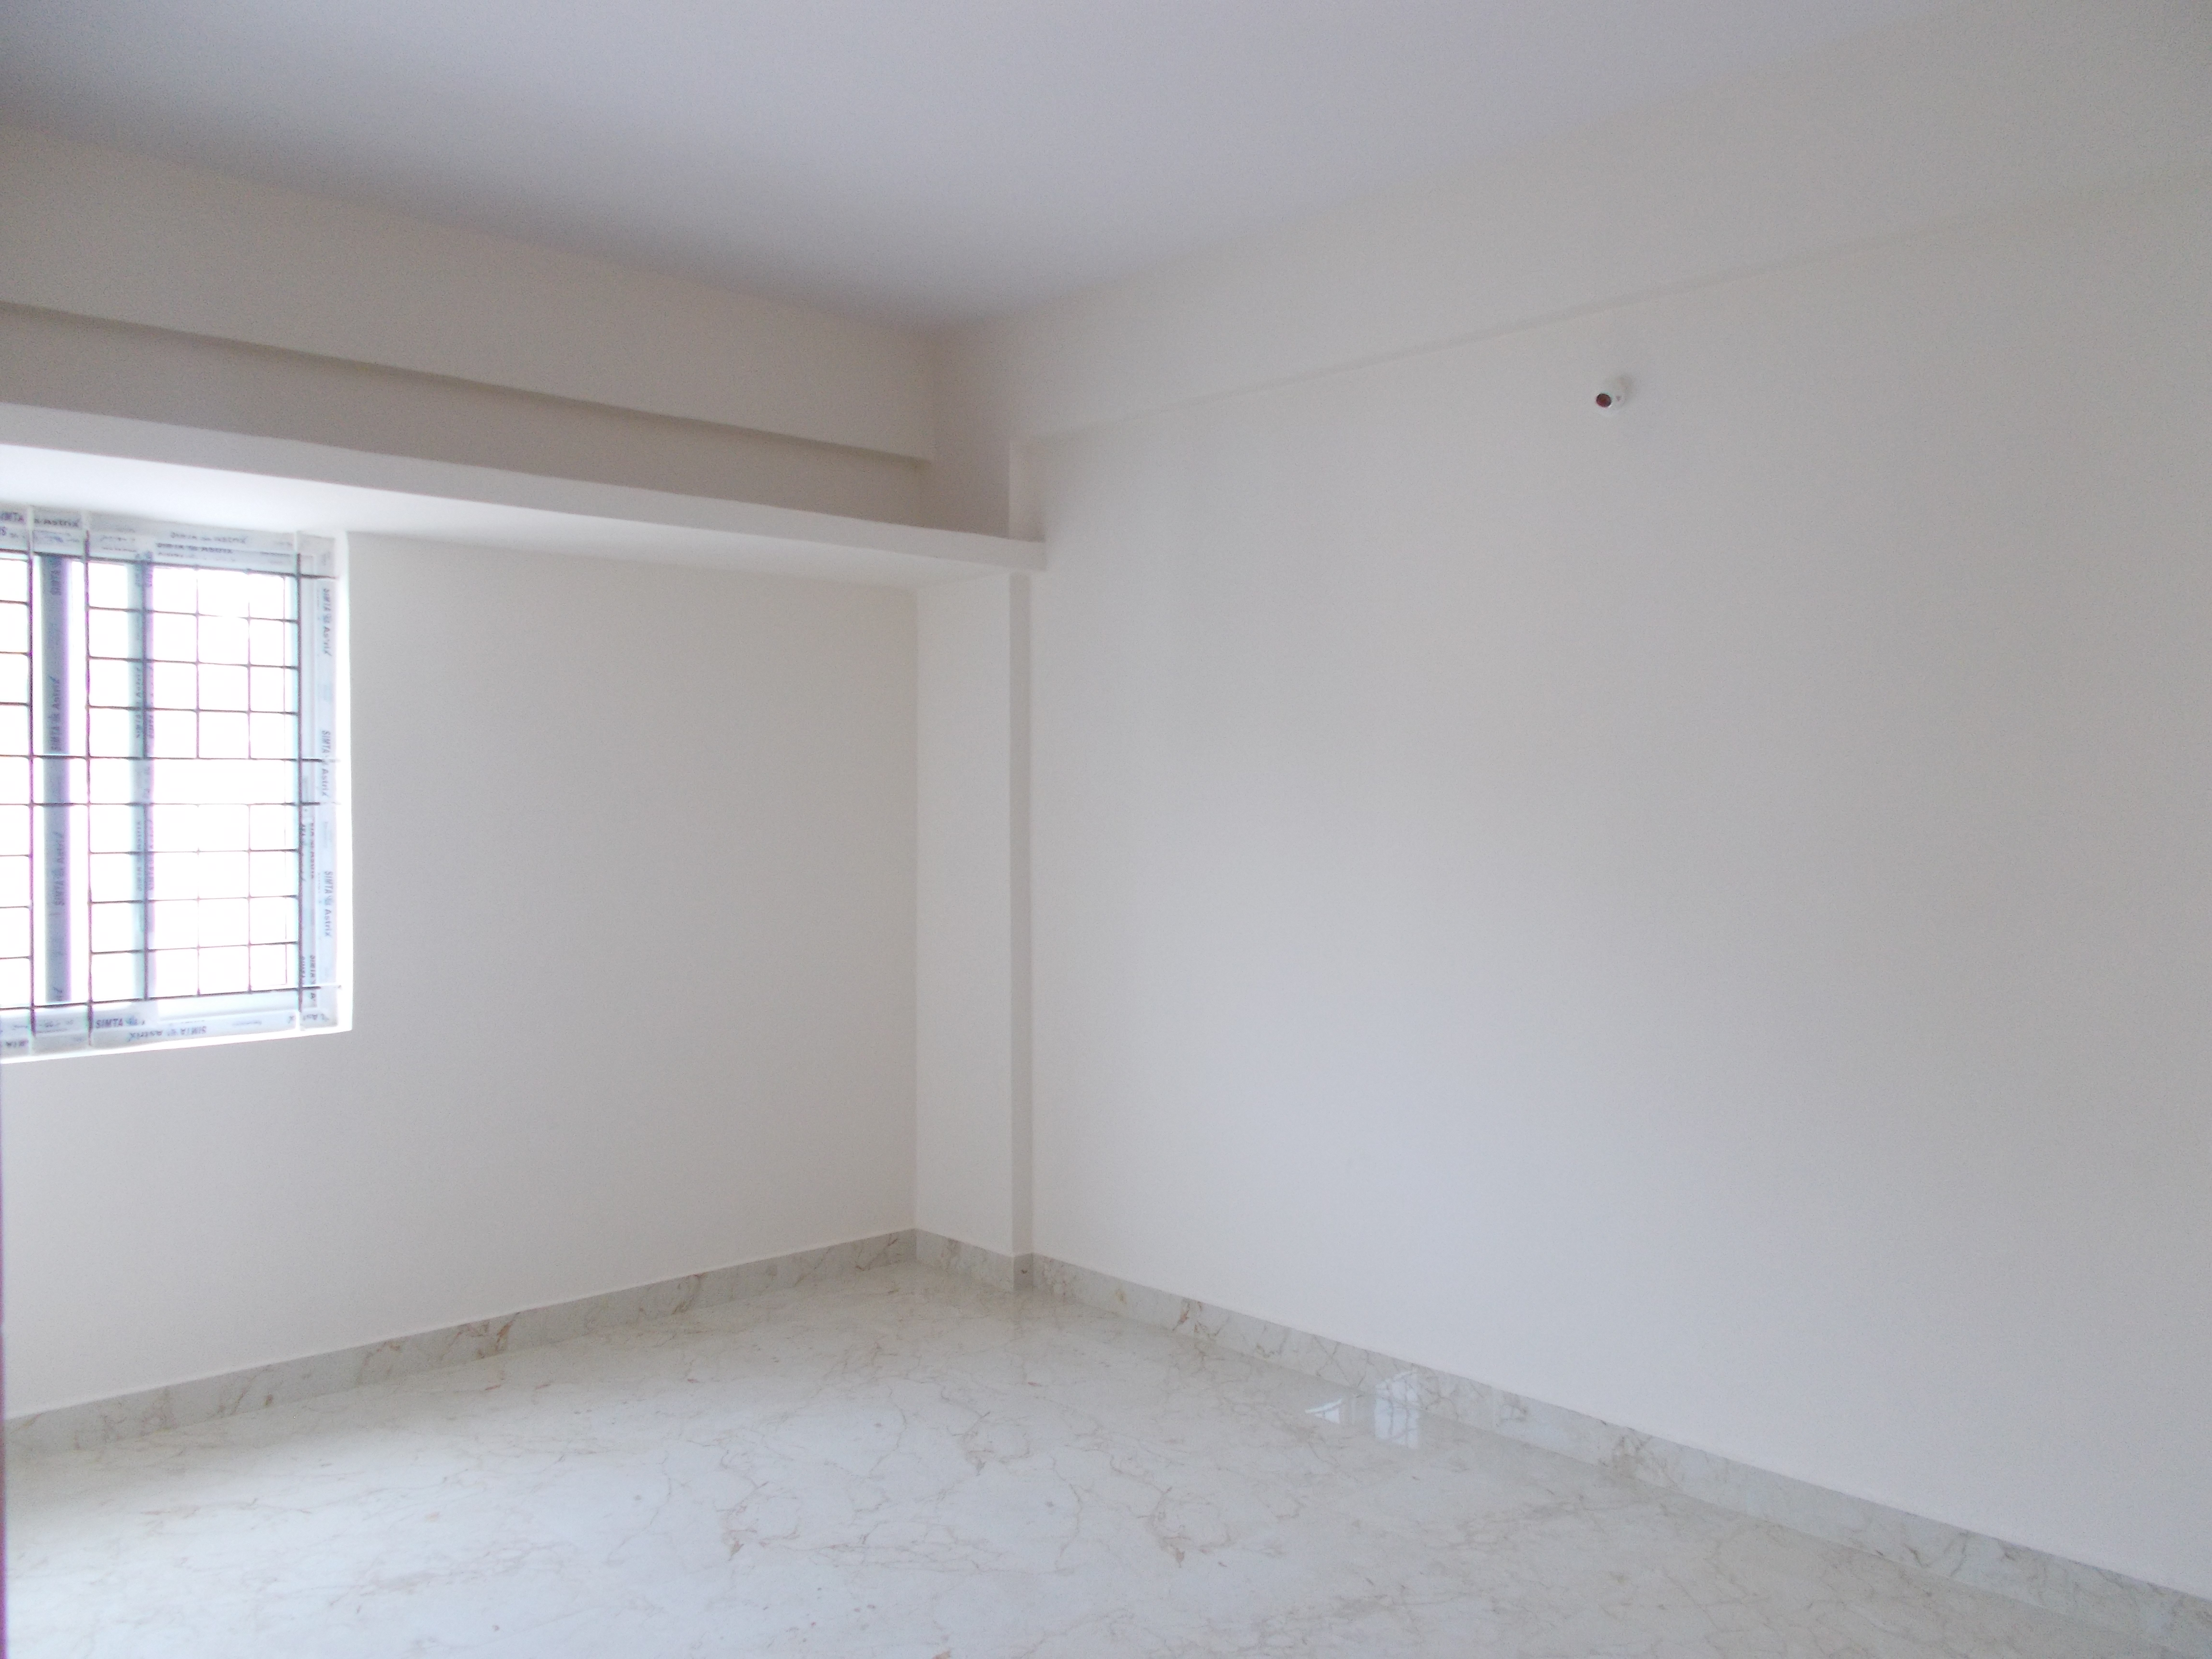 13A8U00088: Bedroom 1